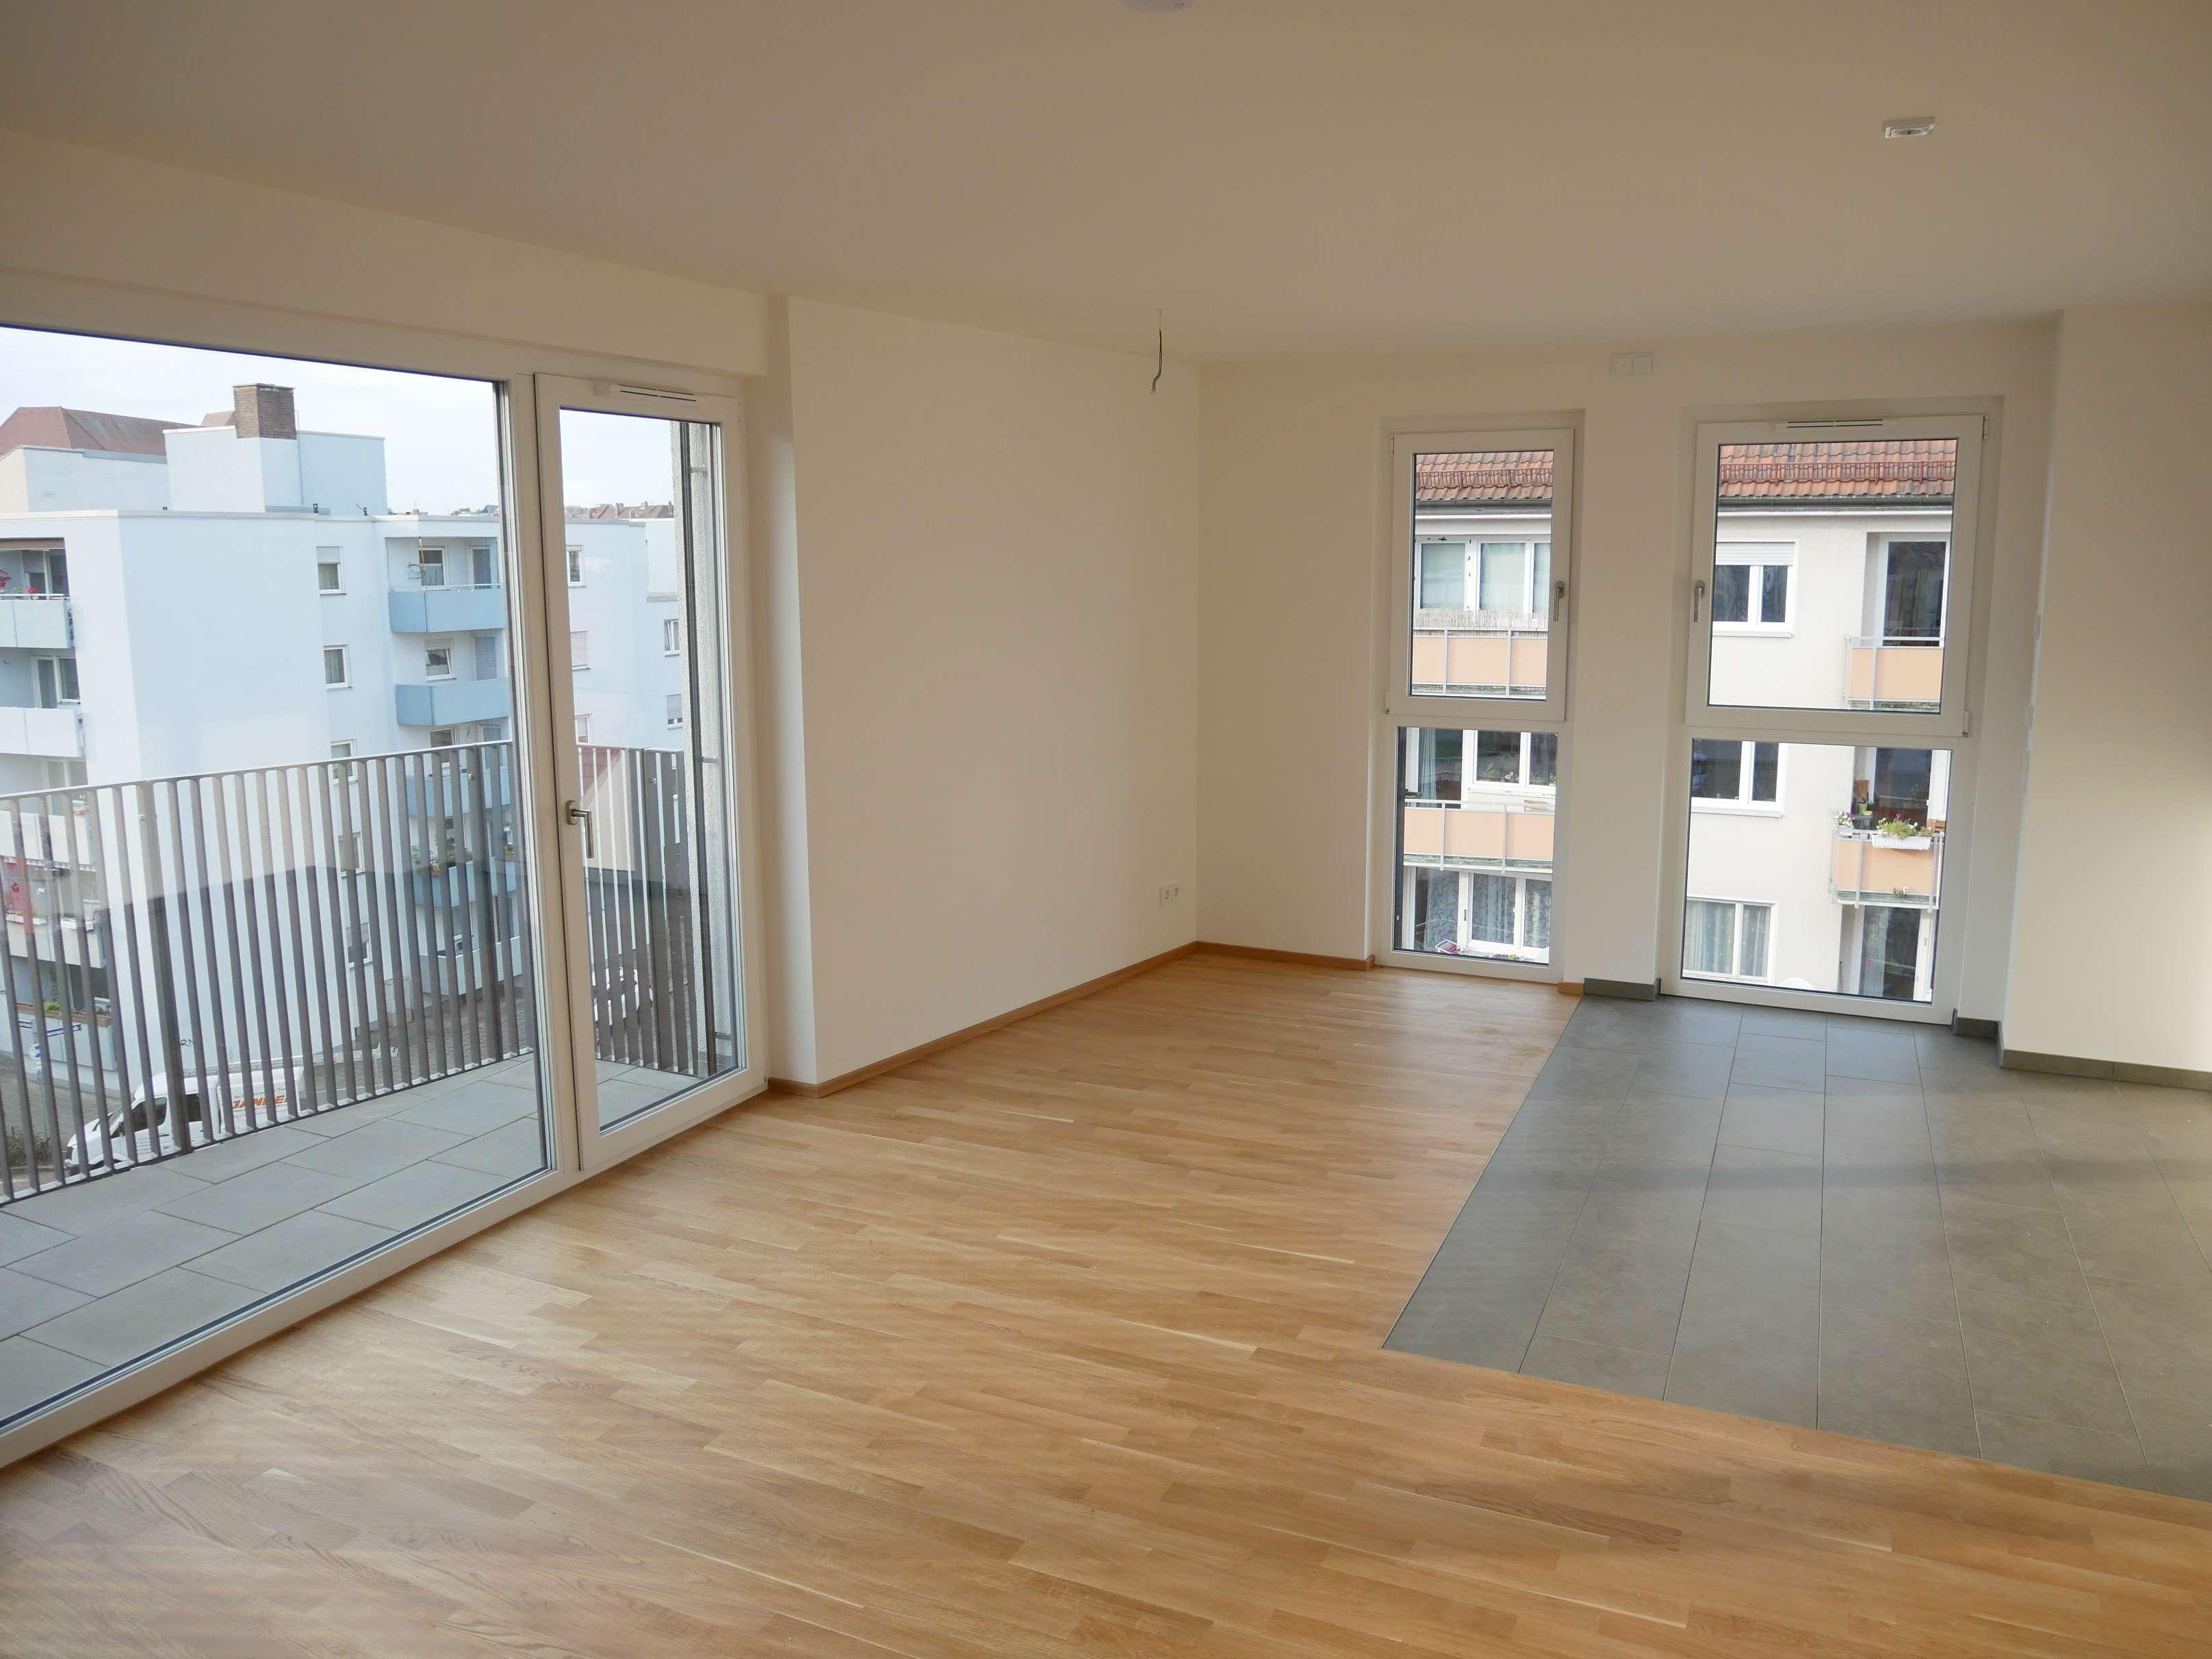 Erstbezug! Exklusive & helle 3-Zimmer-Wohnung am Stadtpark (4.OG, Lift, Parkett, Balkon, TG, …) in Pirckheimerstraße (Nürnberg)